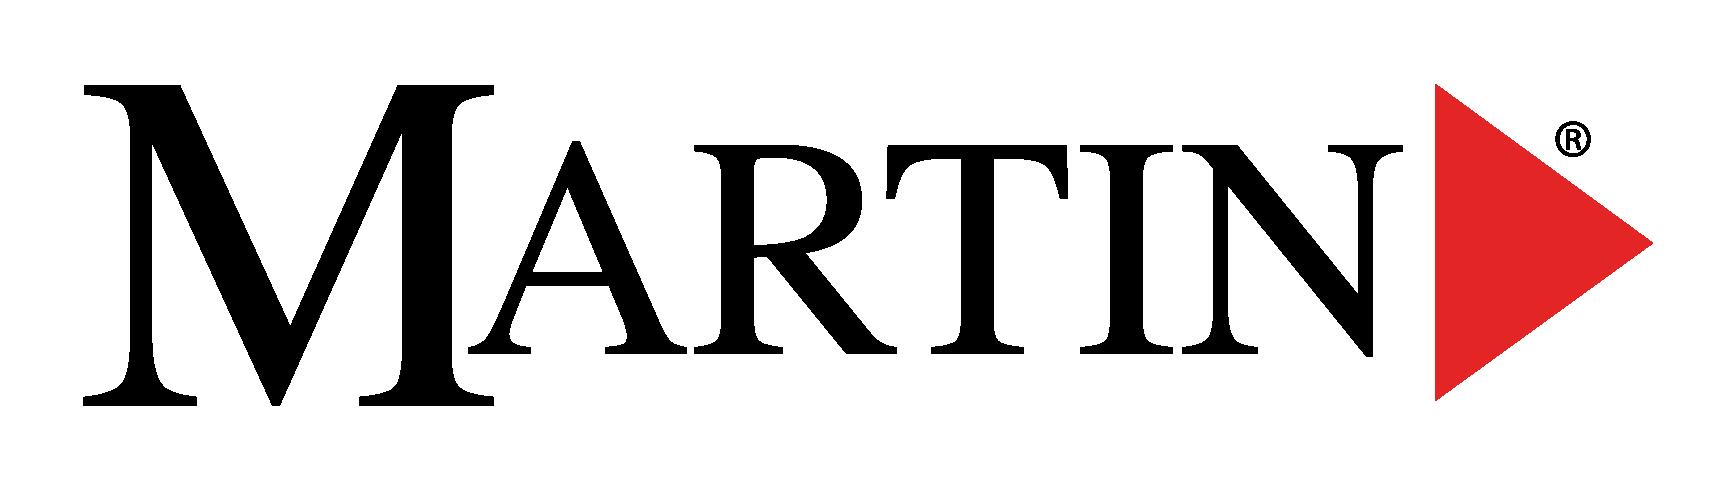 martin